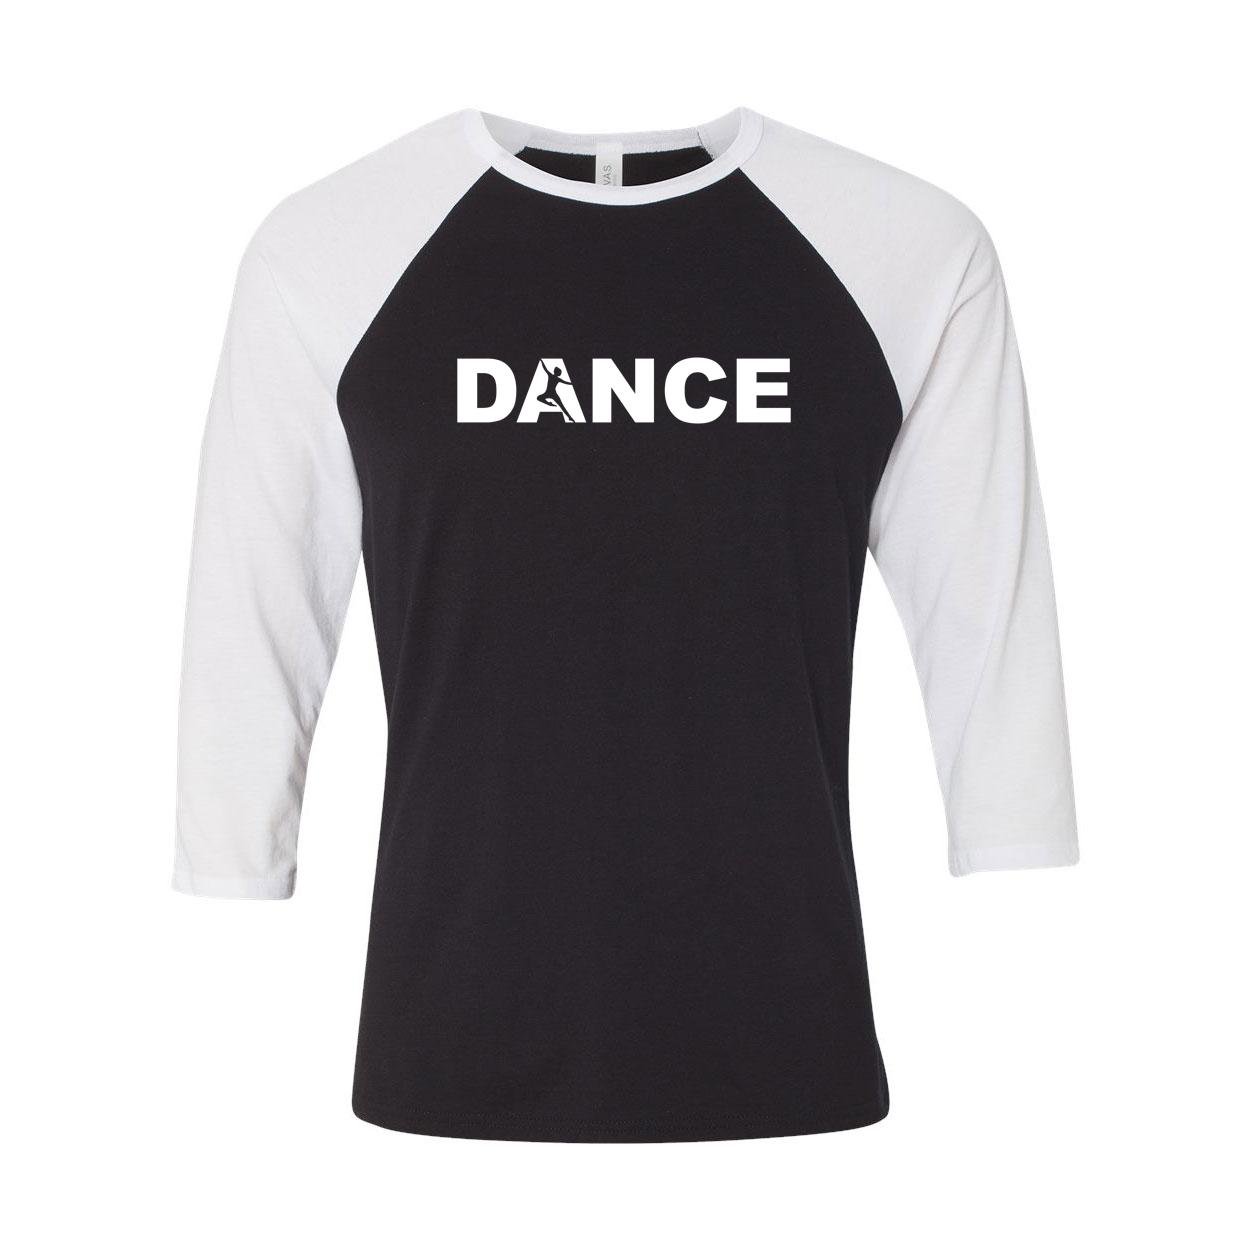 Dance Silhouette Logo Classic Raglan Shirt Black/White (White Logo)